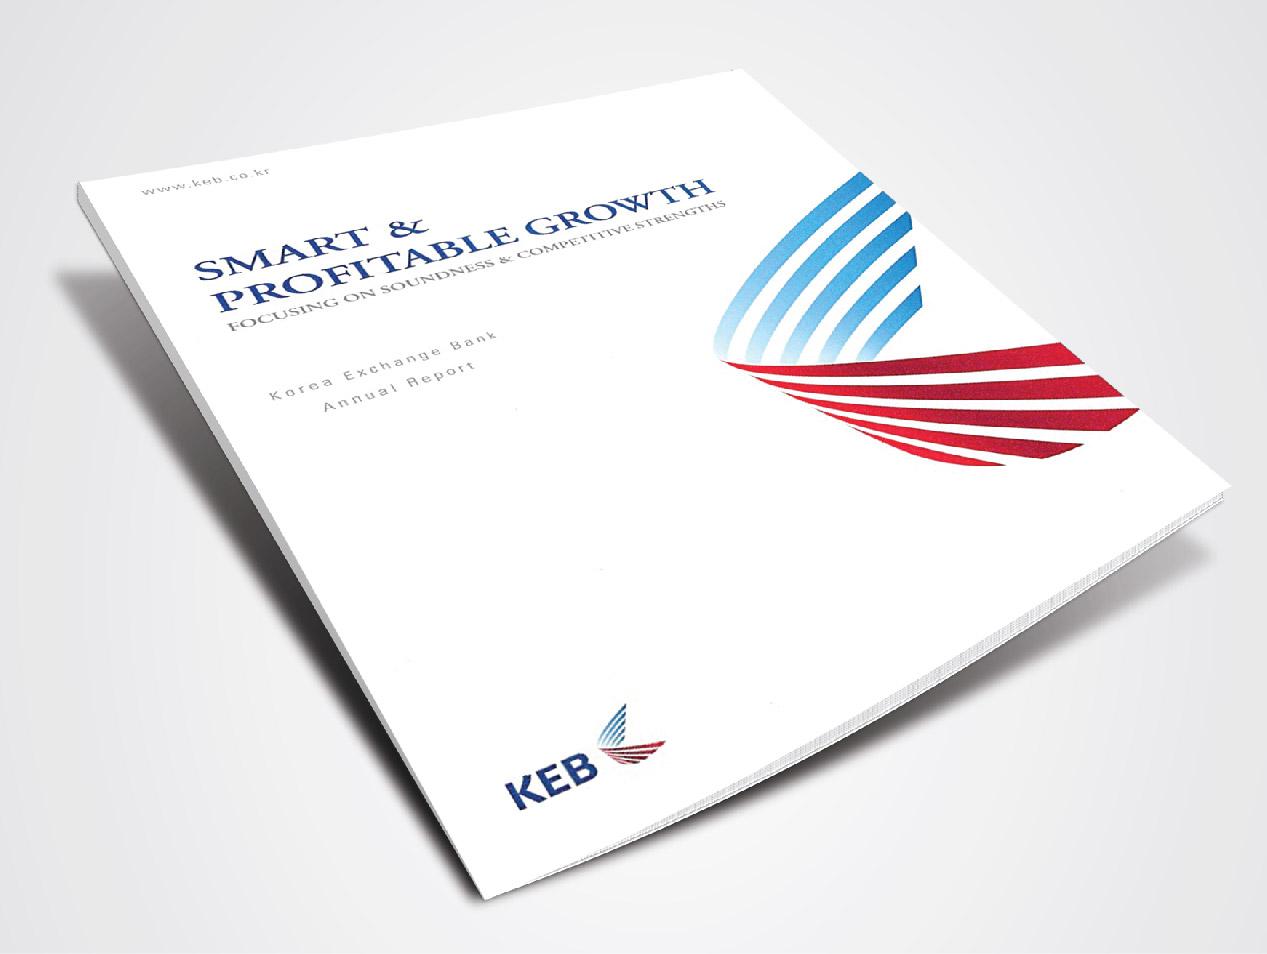 Annual Report 8